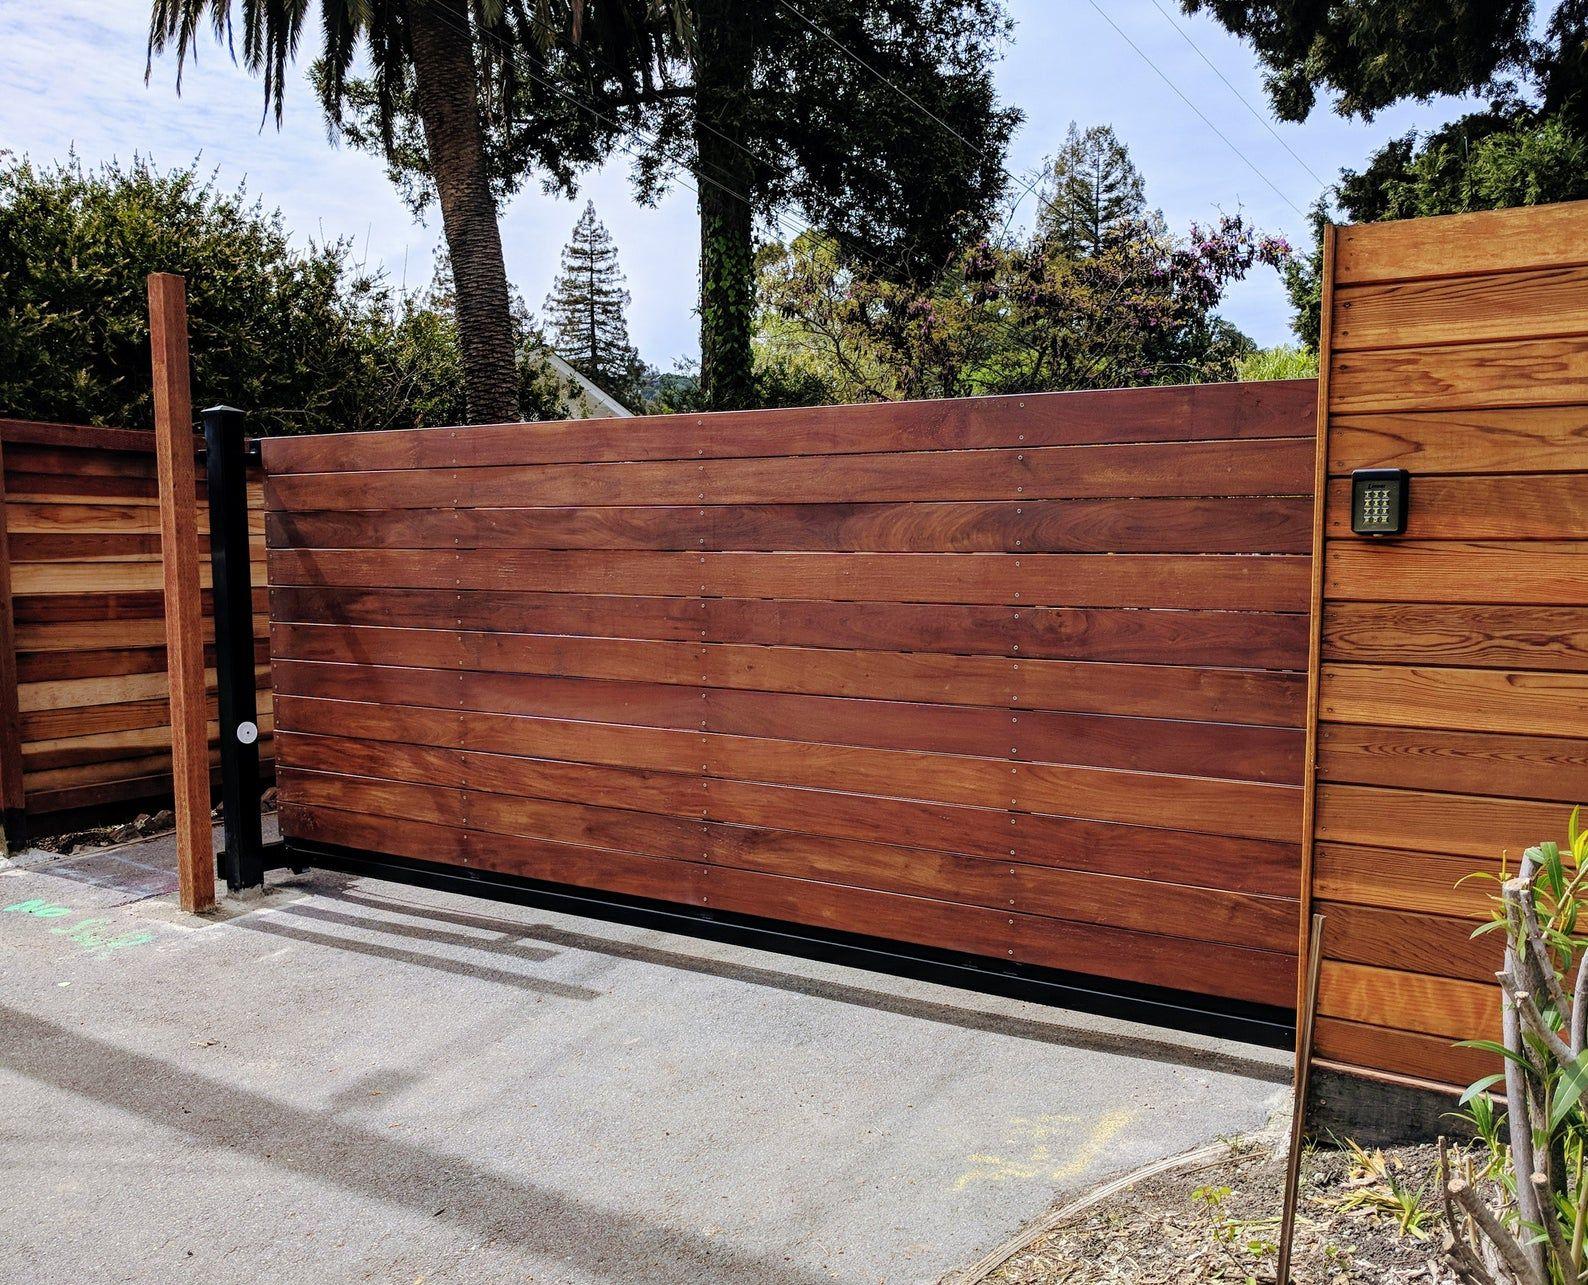 Wooden Driveway Gate Kit Wrought Iron Horizontal Ironwood Etsy In 2020 Wooden Gates Driveway Wood Gates Driveway Wood Gate